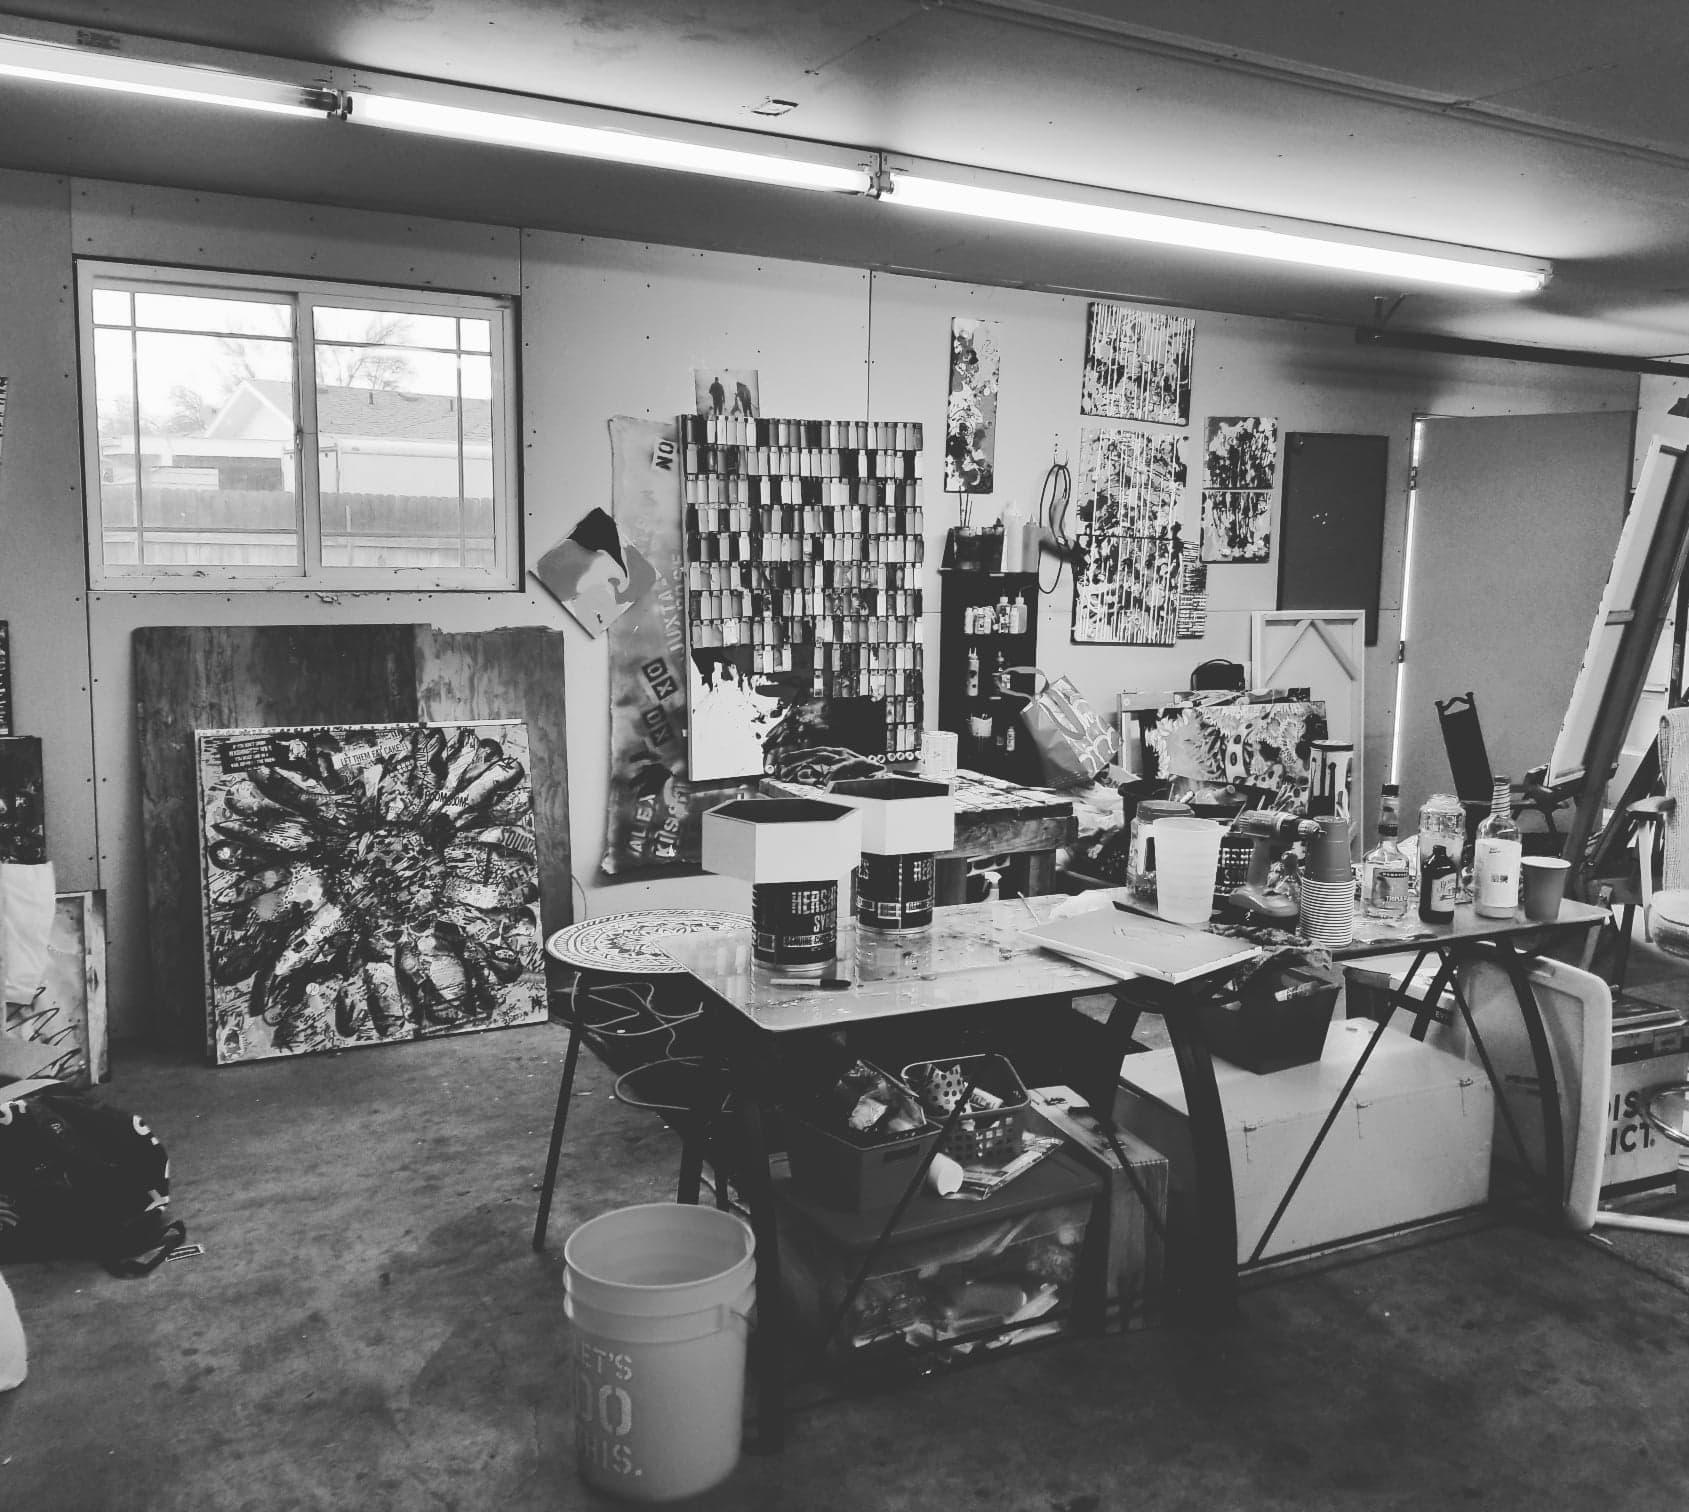 Garage Studio 2017-2018 Richland, WA